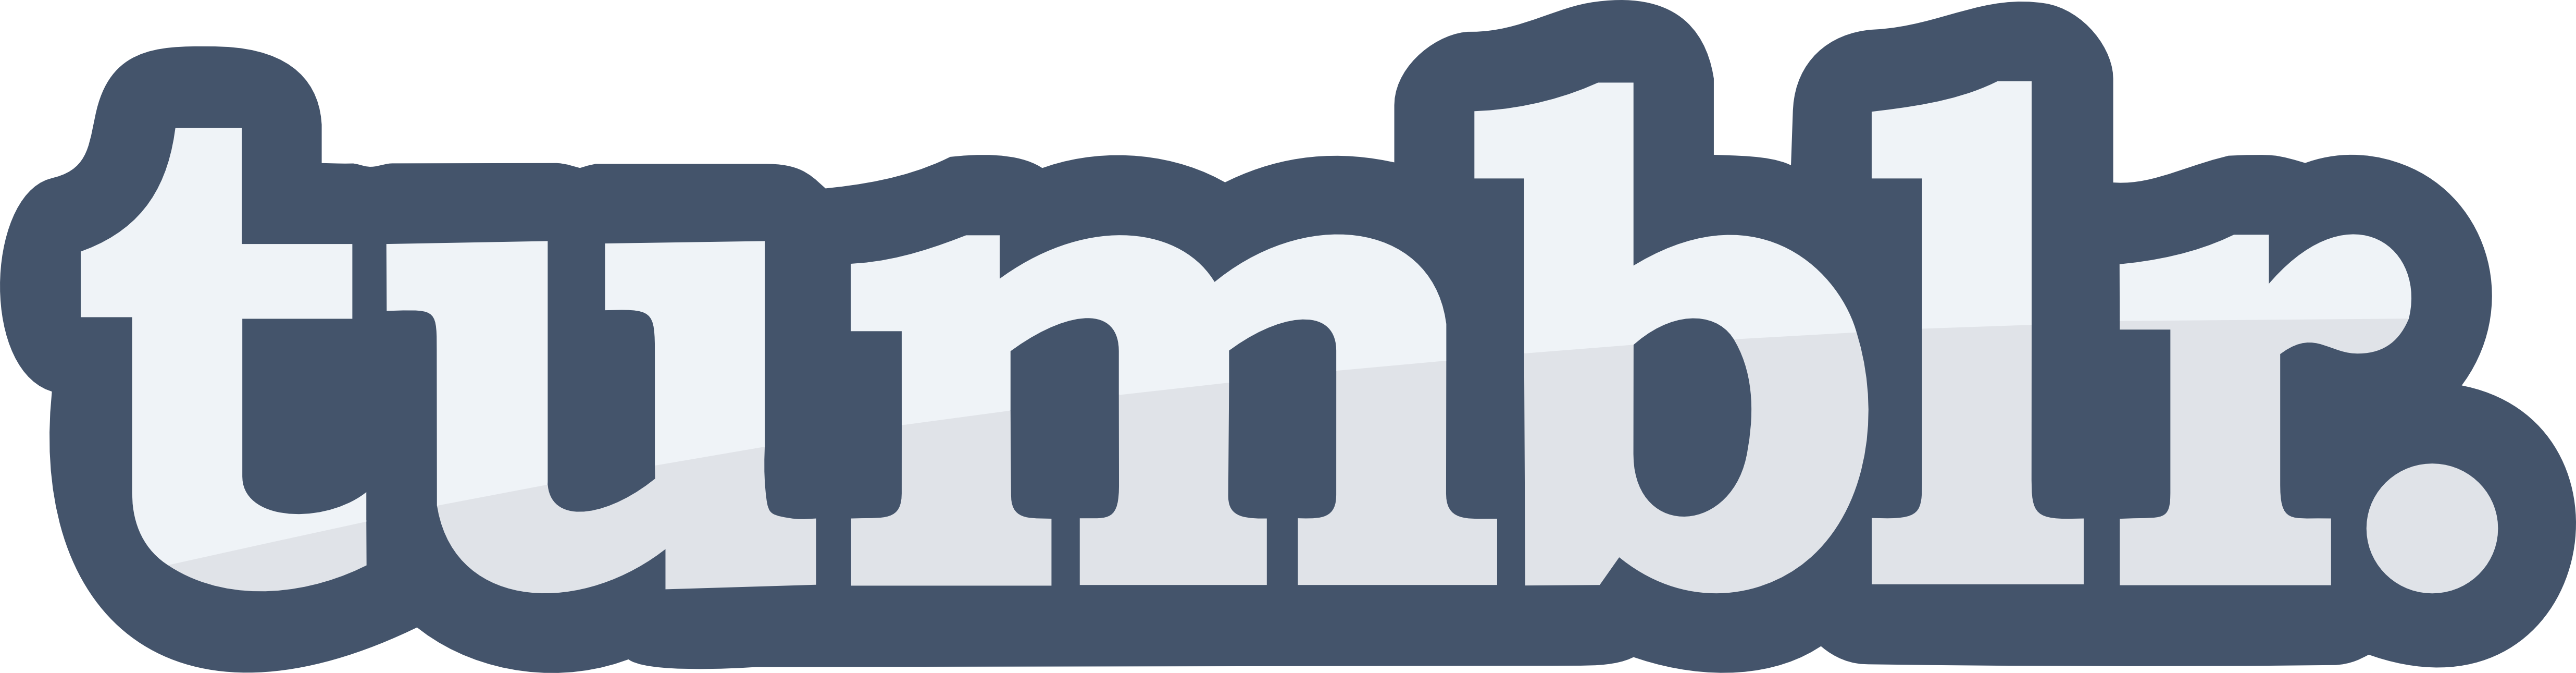 4945x1291 Tumblr Logo Design Vector Free Download